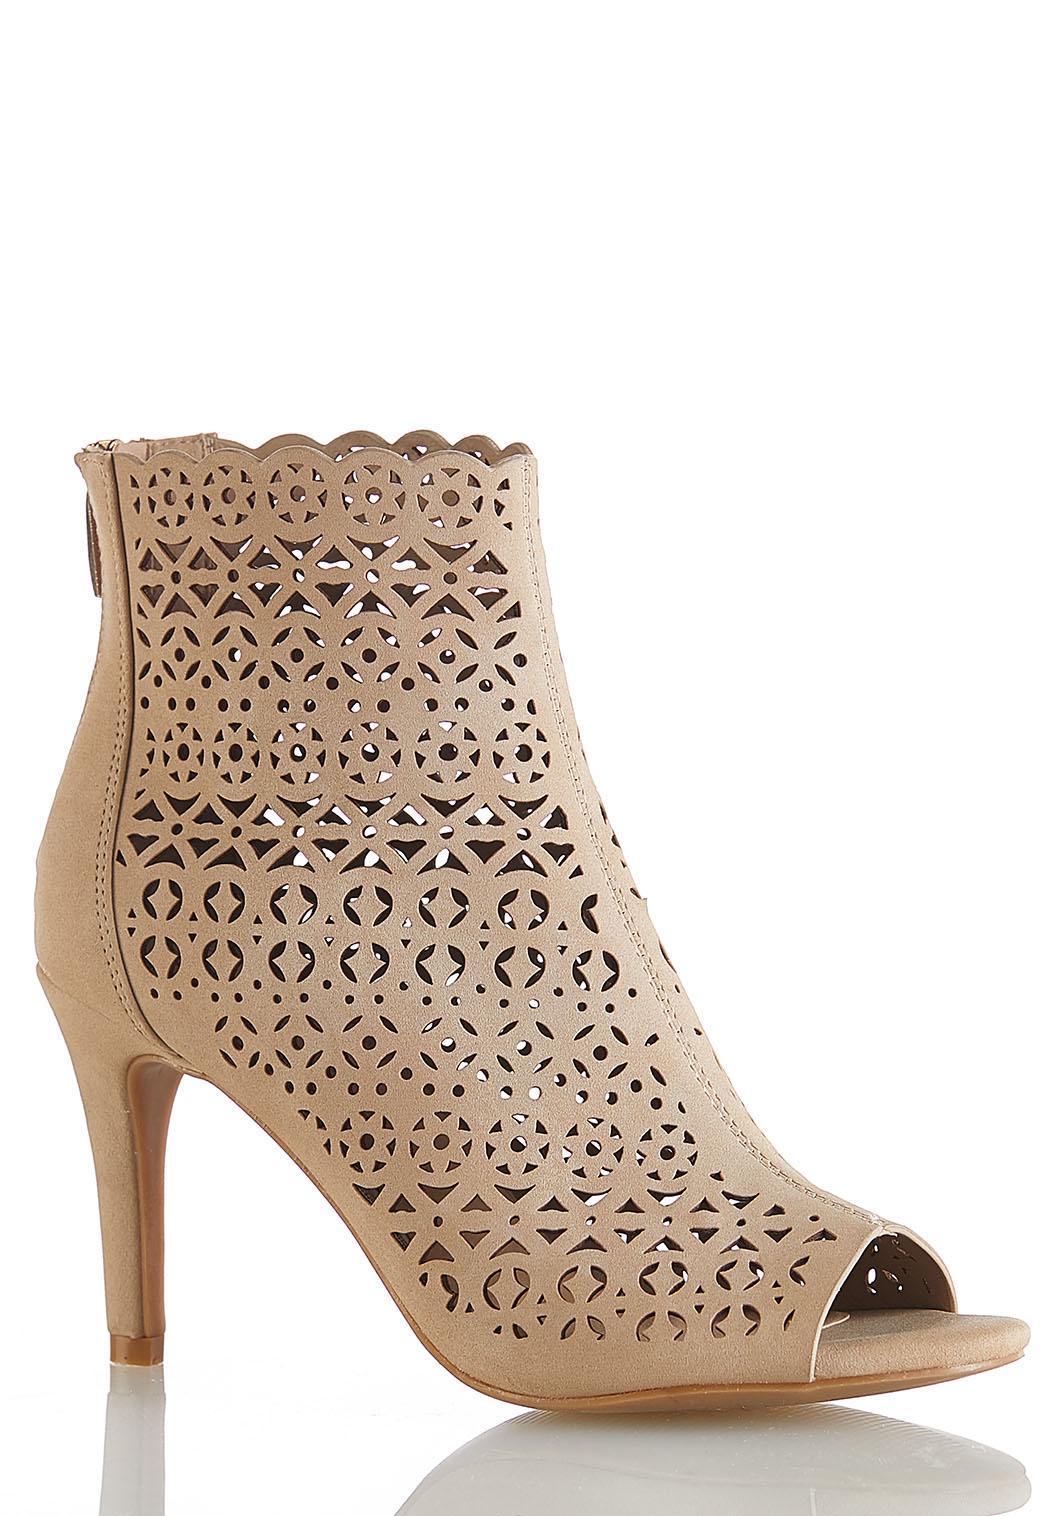 Laser Cut Peep Toe Heels